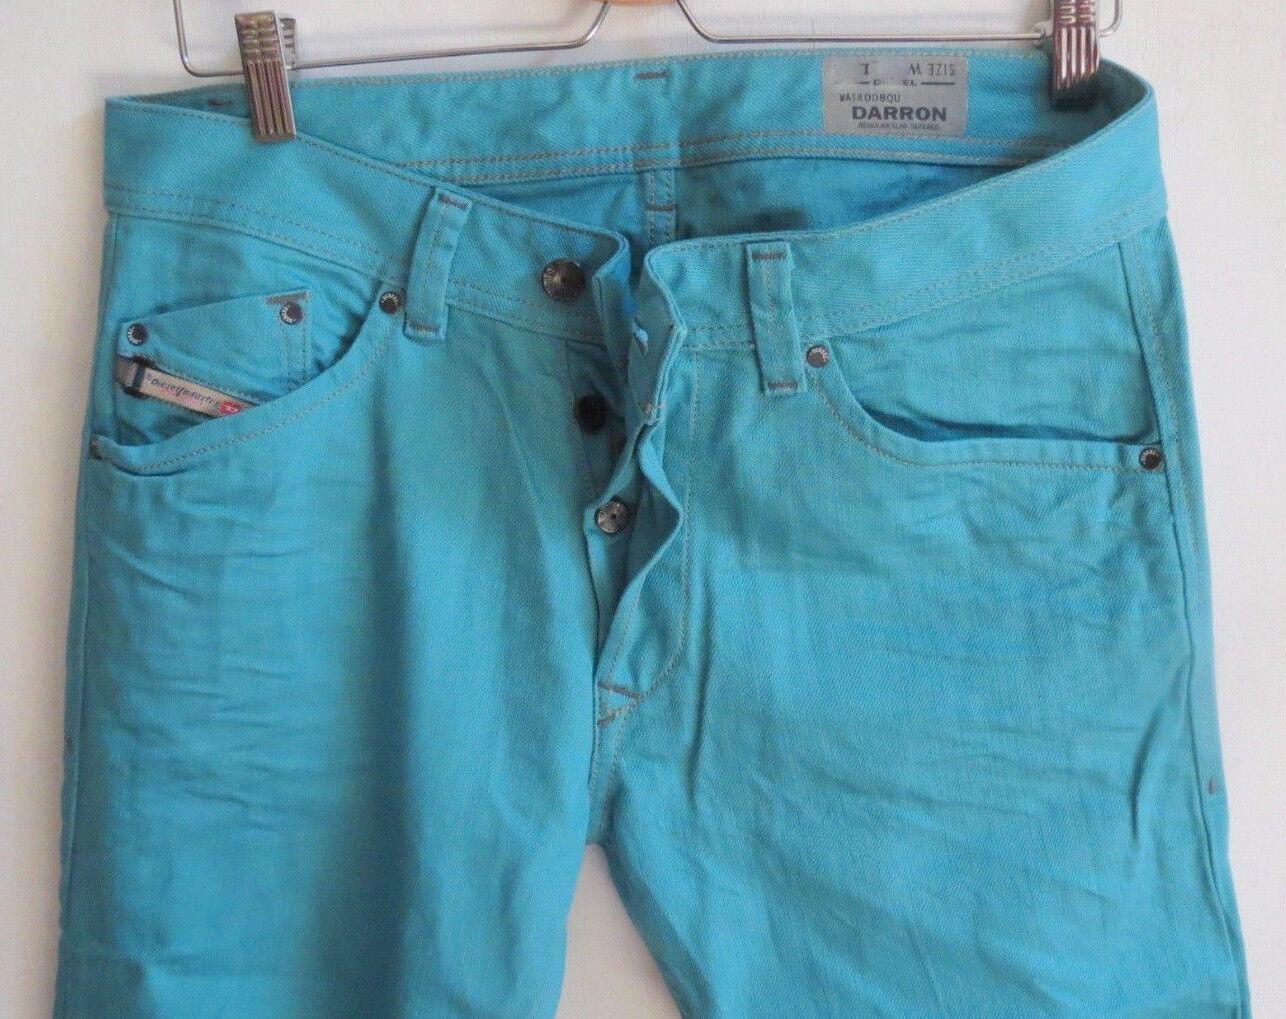 Diesel Men Jeans 33 W x 32 Darron 8QU Teal Regular Slim Brand New with Tags